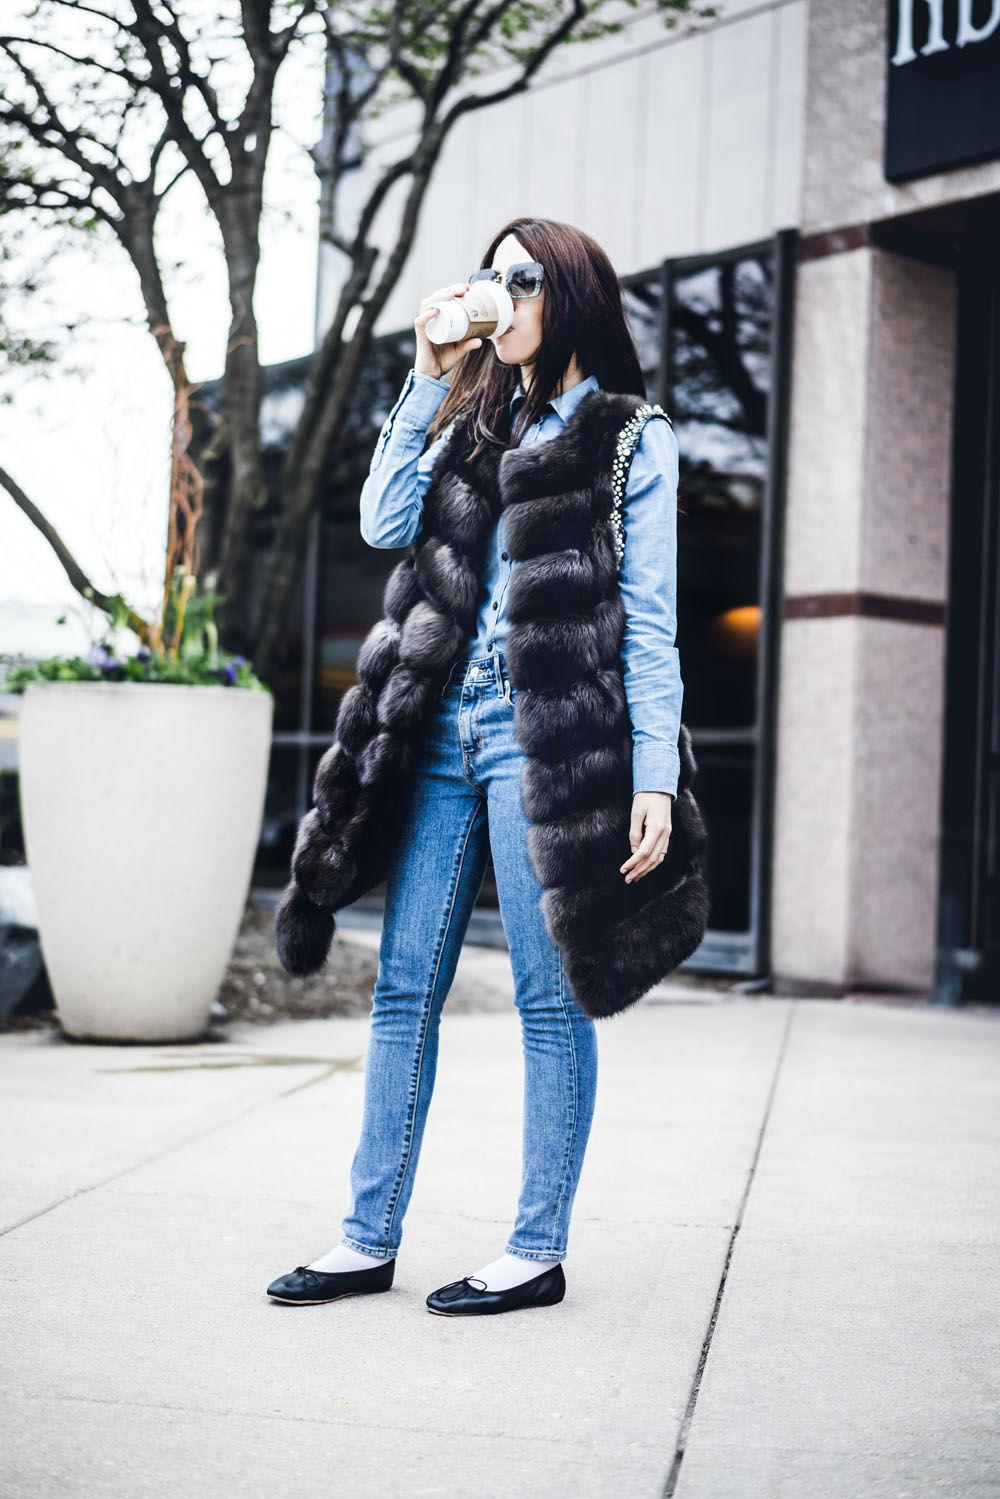 100k instagram followers lady fur sable fur coat